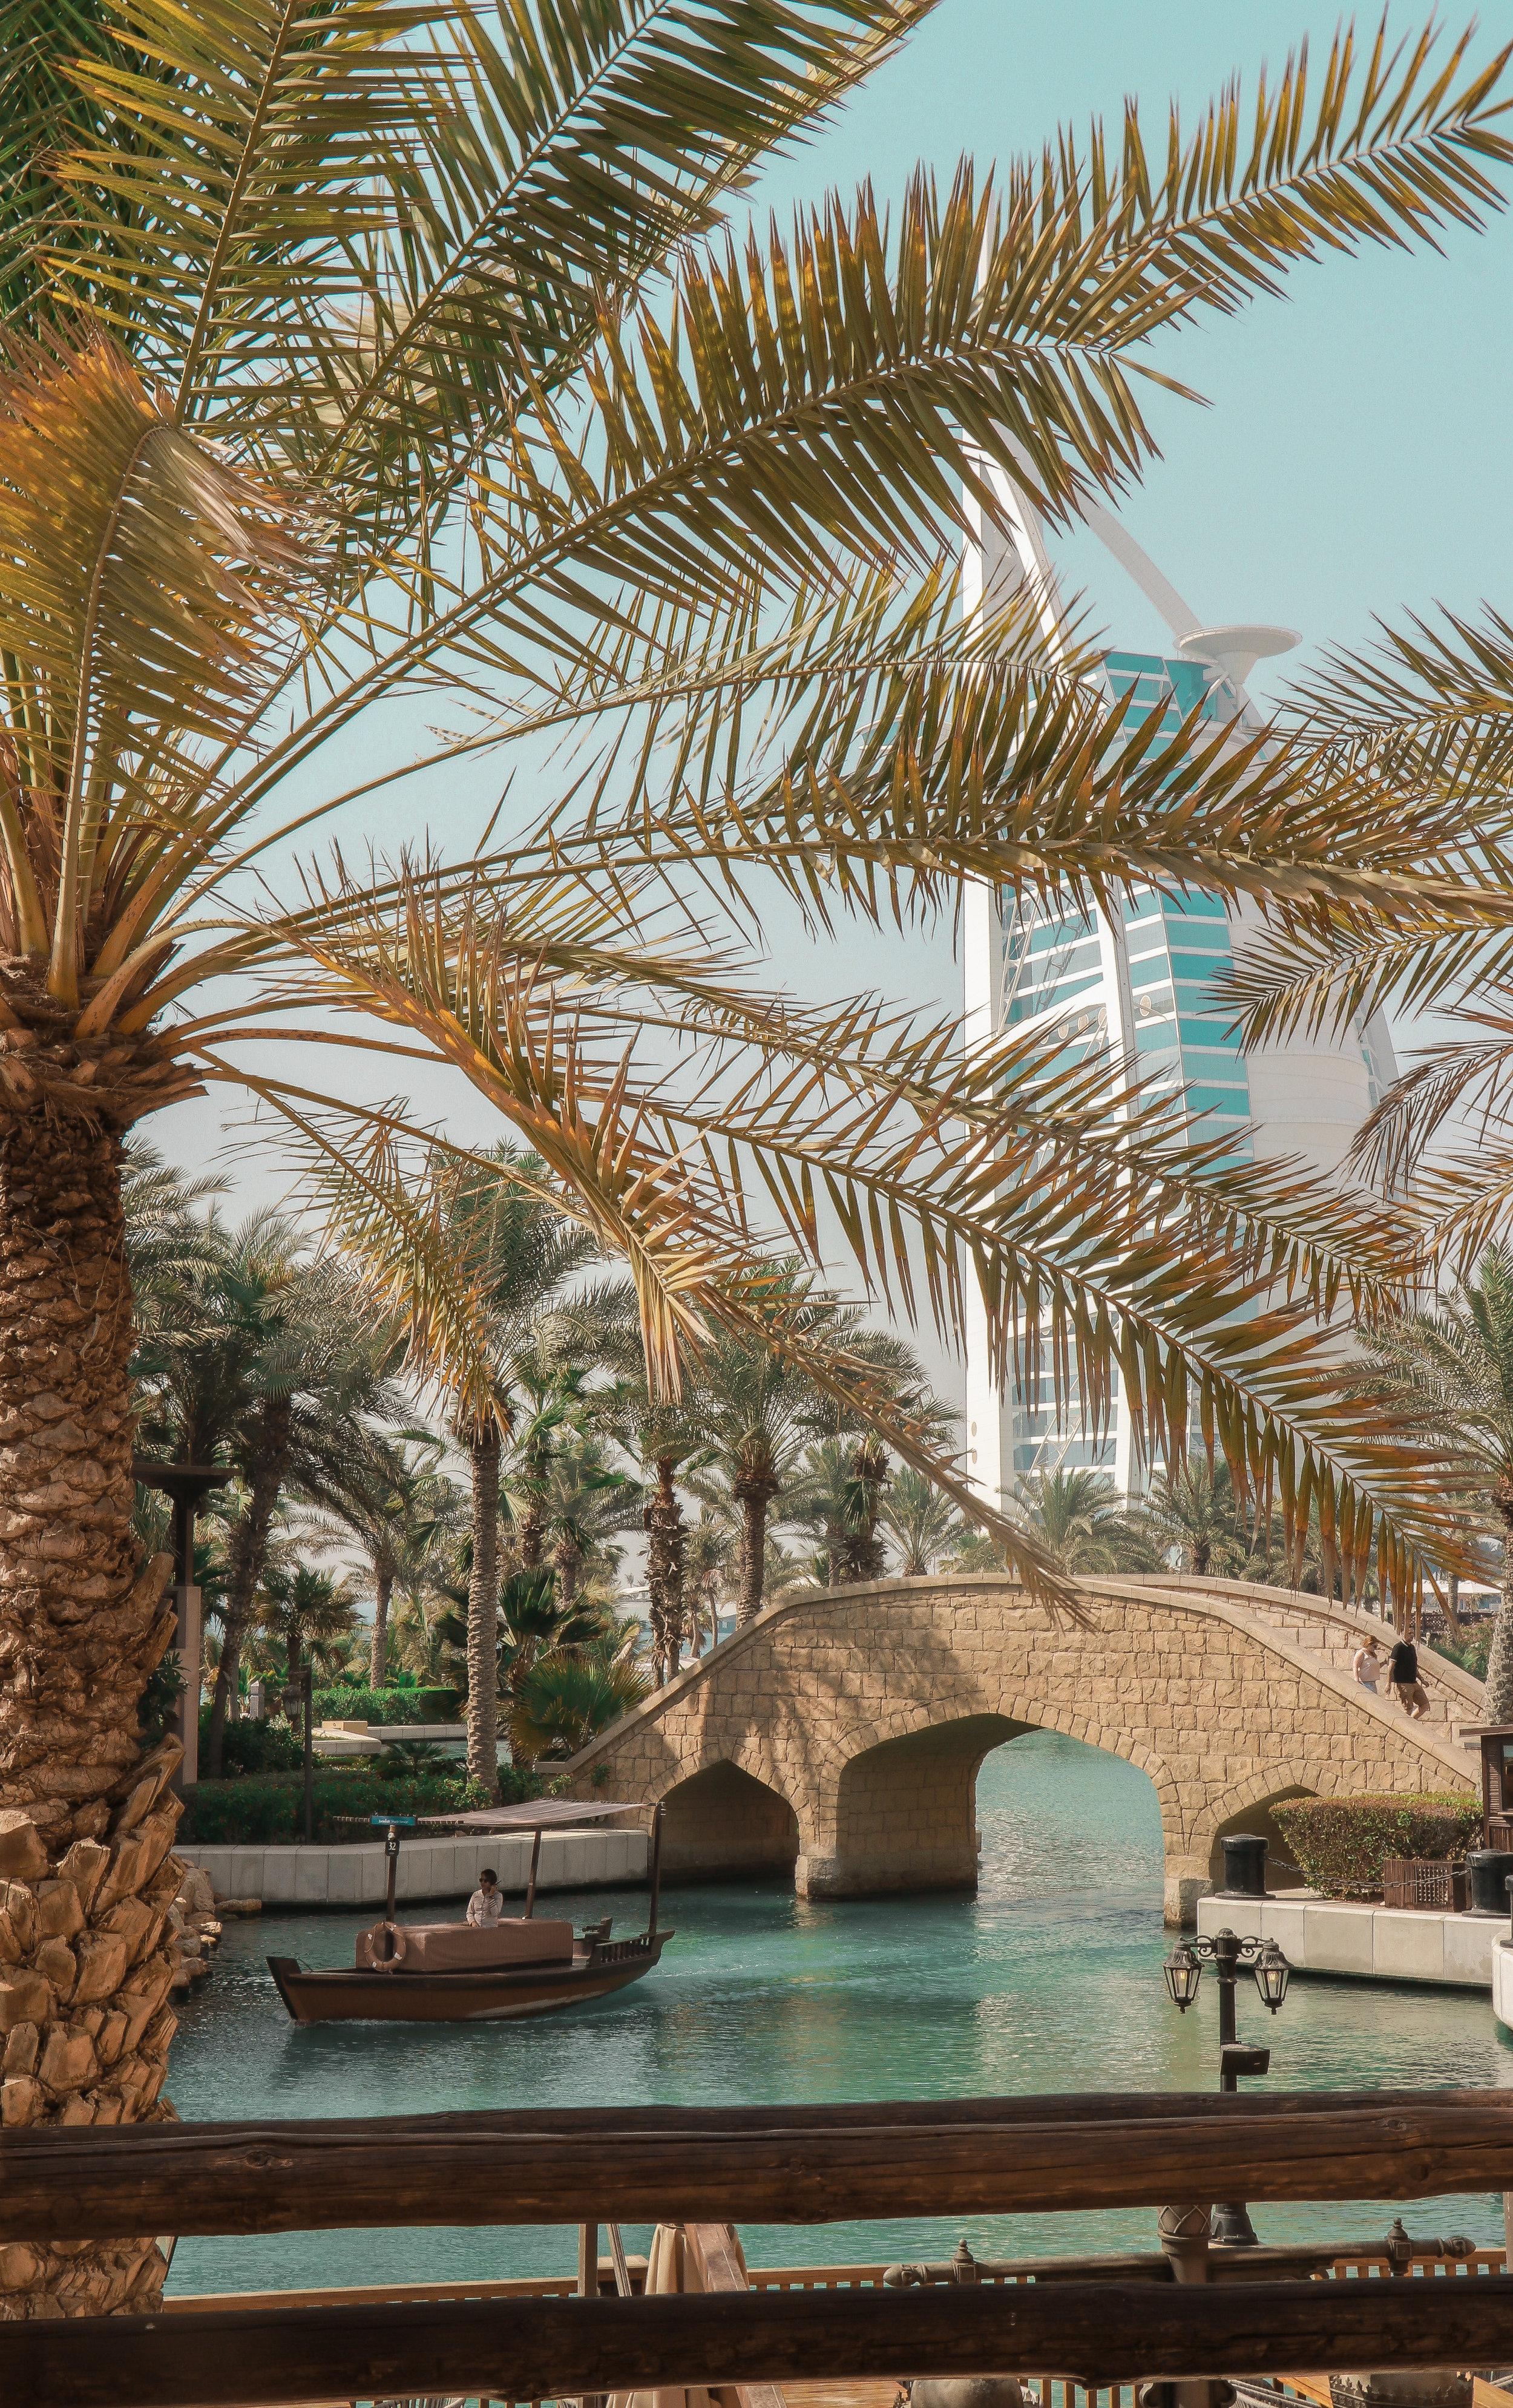 Dubai Jumeirah photo Linda Haggh.jpg